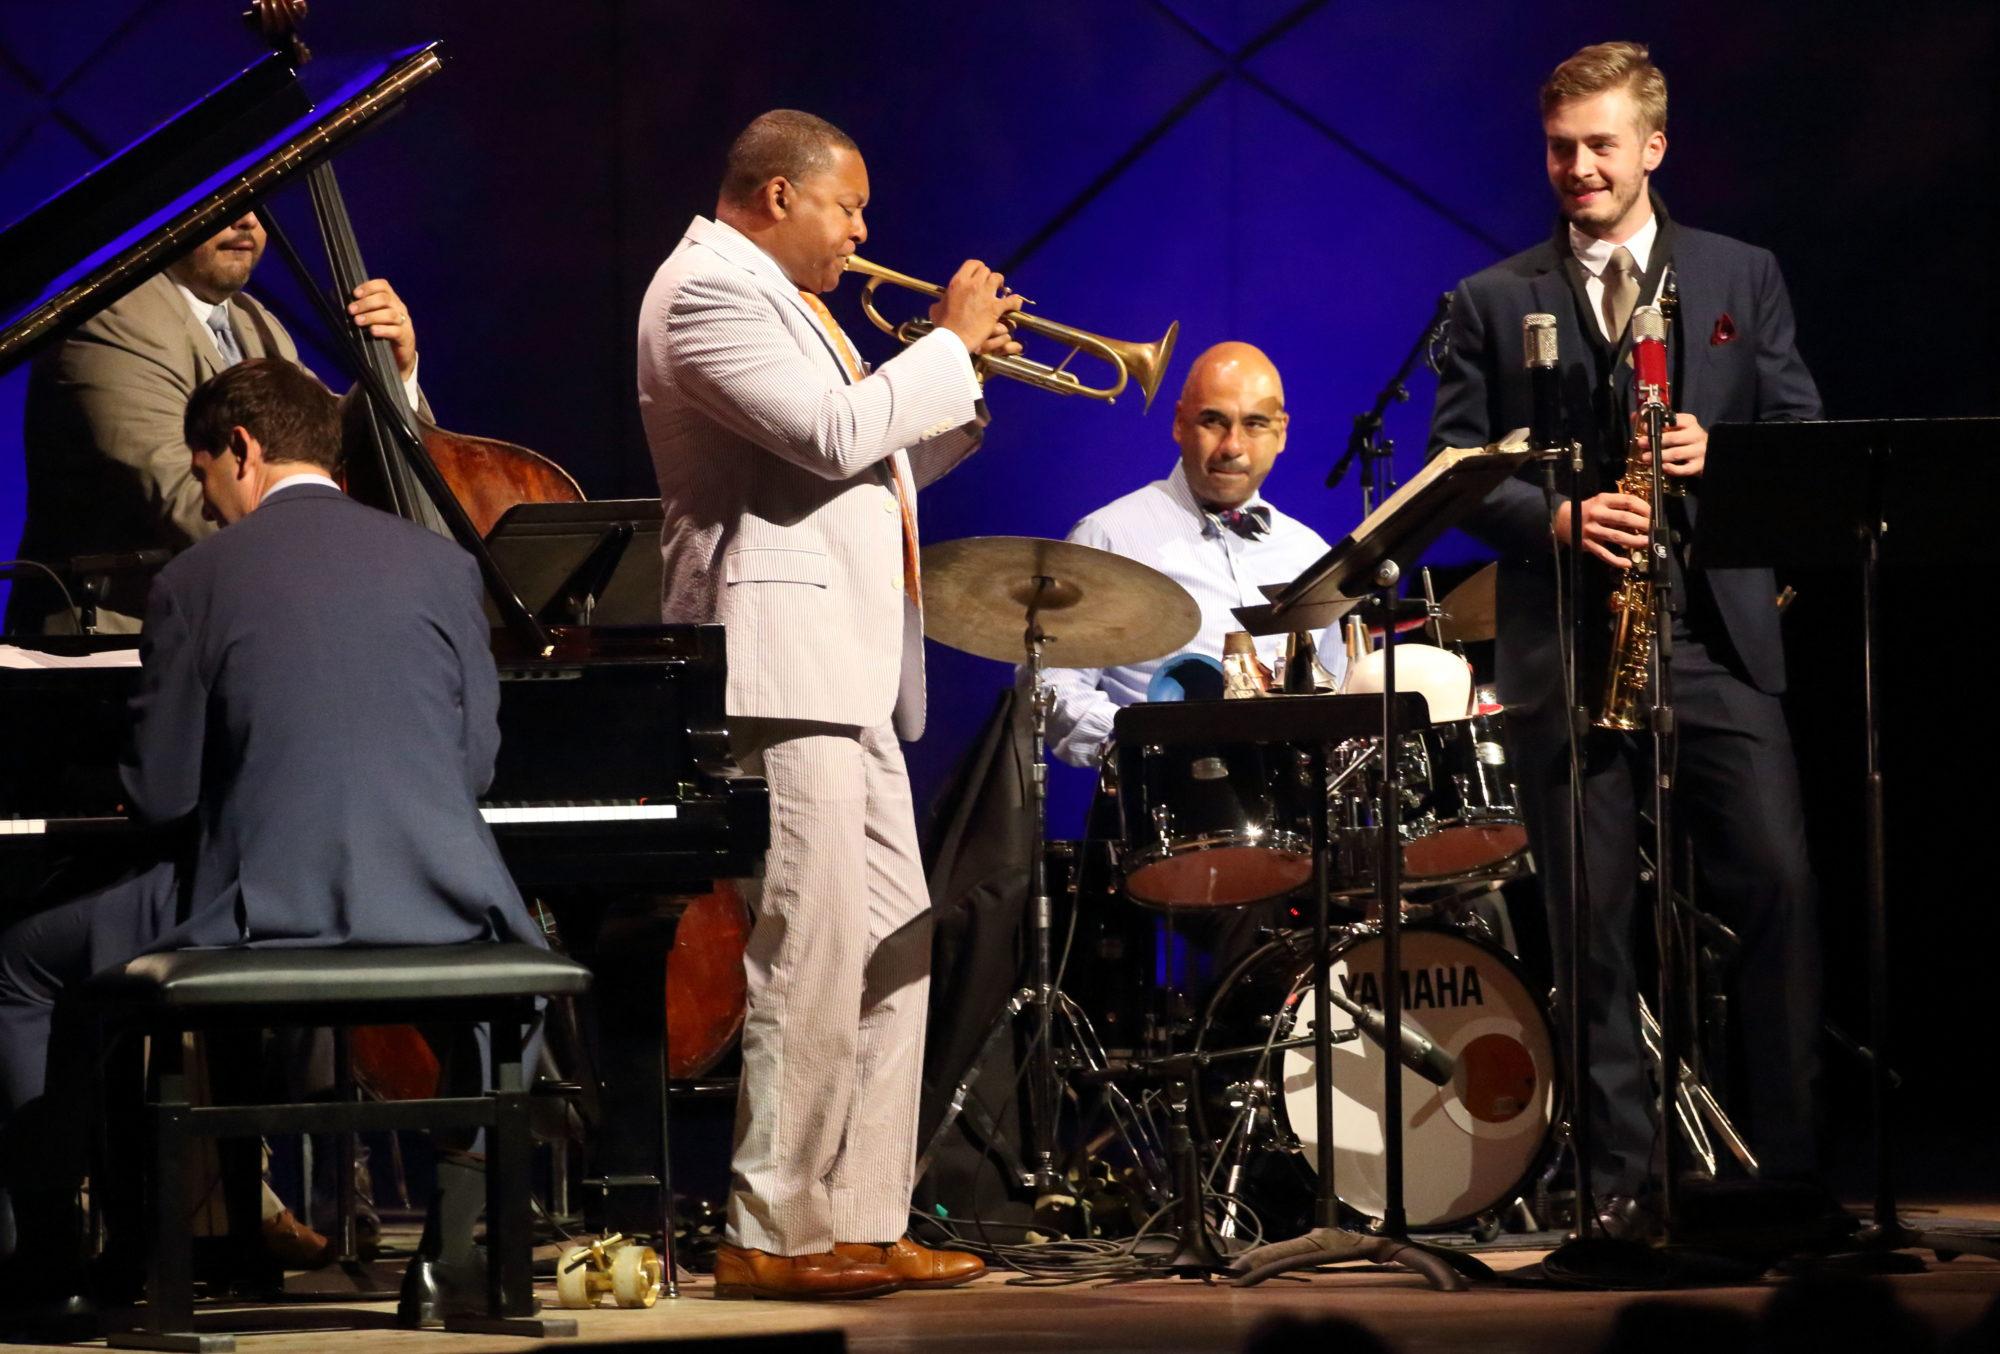 Wynton Marsalis Quintet and Ellis Marsalis Quintet at Tanglewood Sept. 1, 2018; Hilary Scott photo.